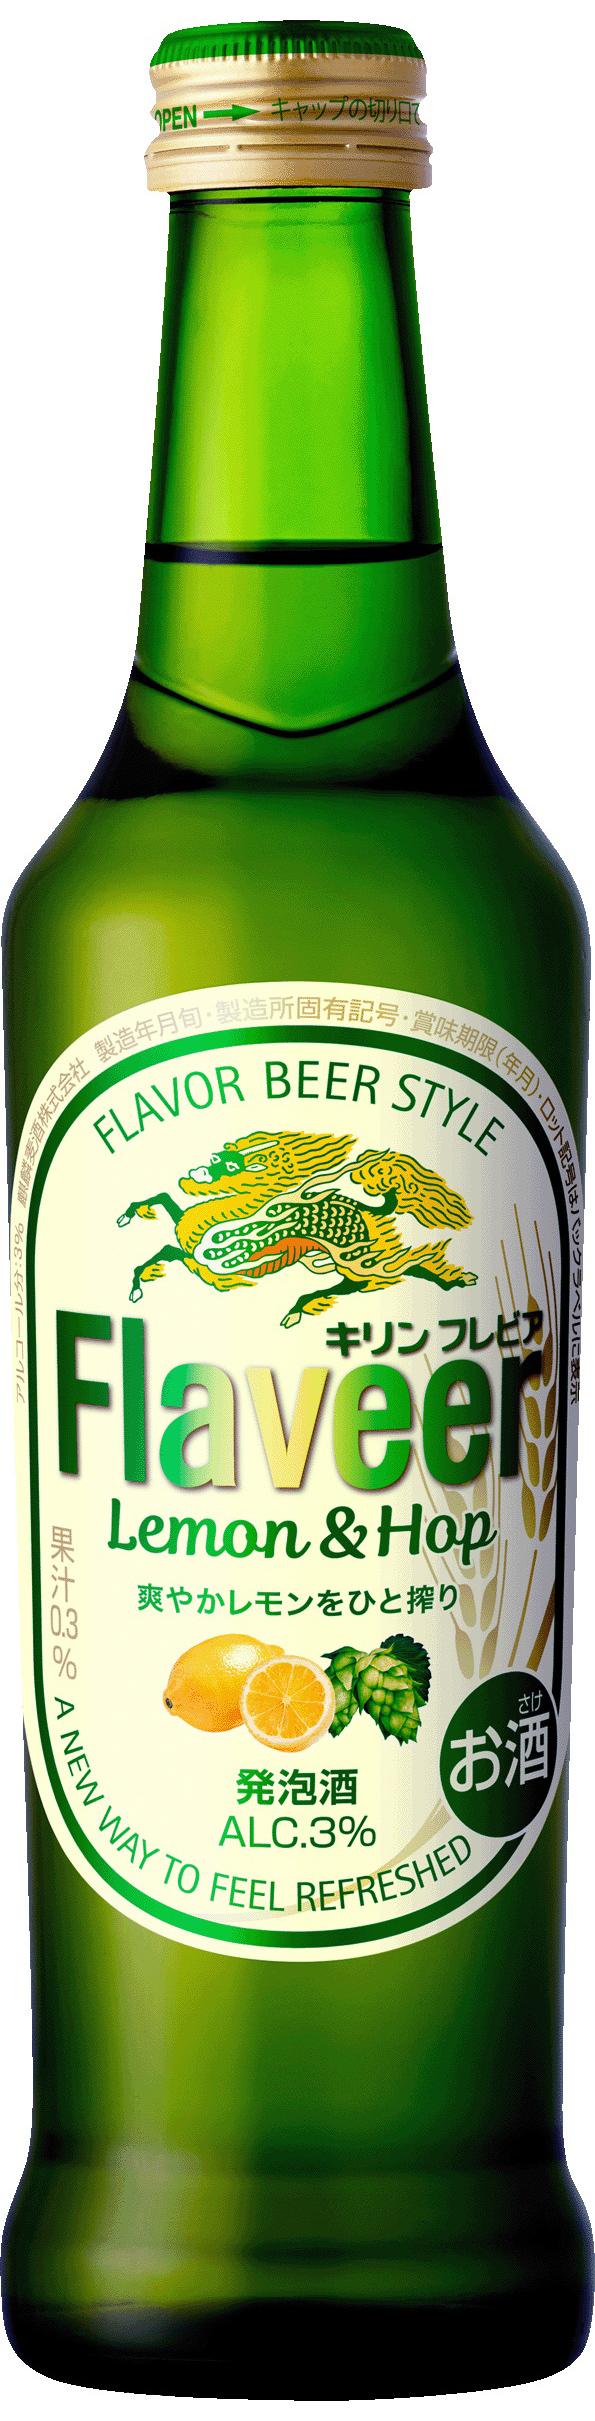 kirin_flaveer